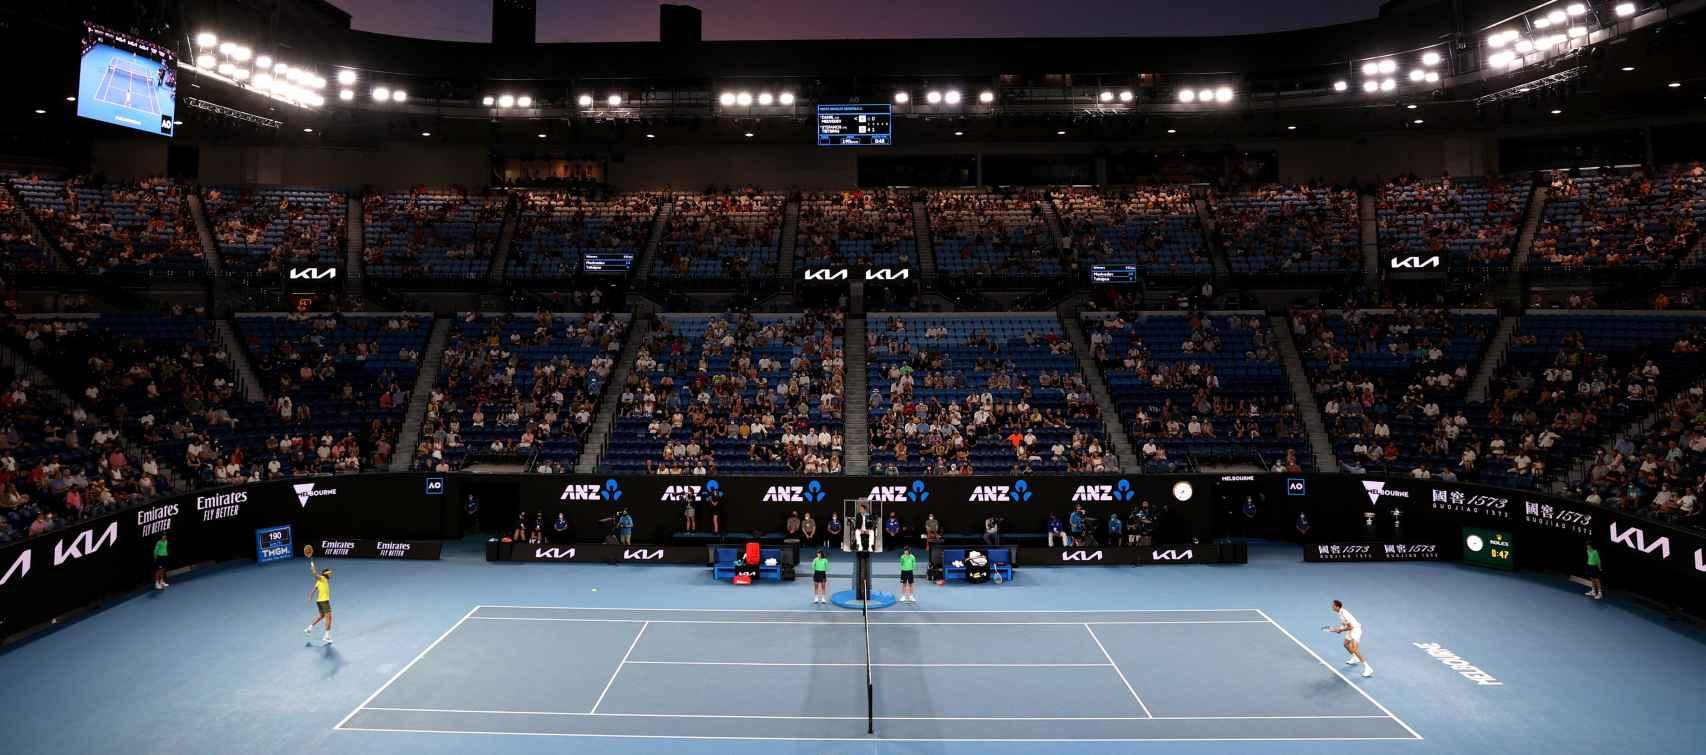 Jennifer Brady - Naomi Osaka: siga en directo la final femenina del Abierto de Australia